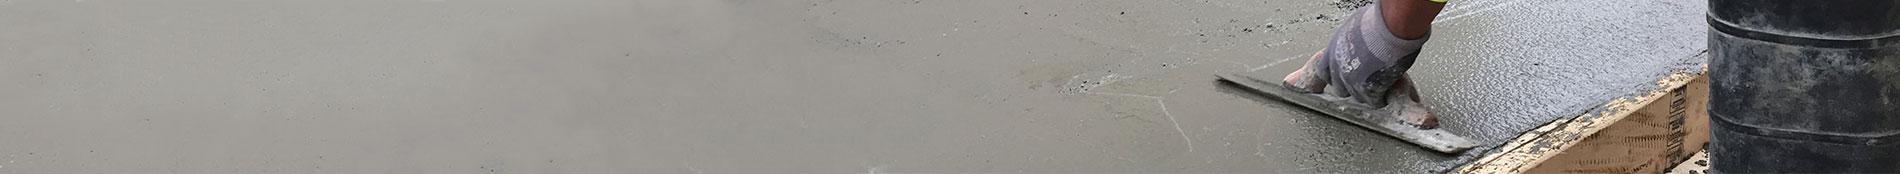 Atlantic Concrete | Atlantic Concrete Contractors